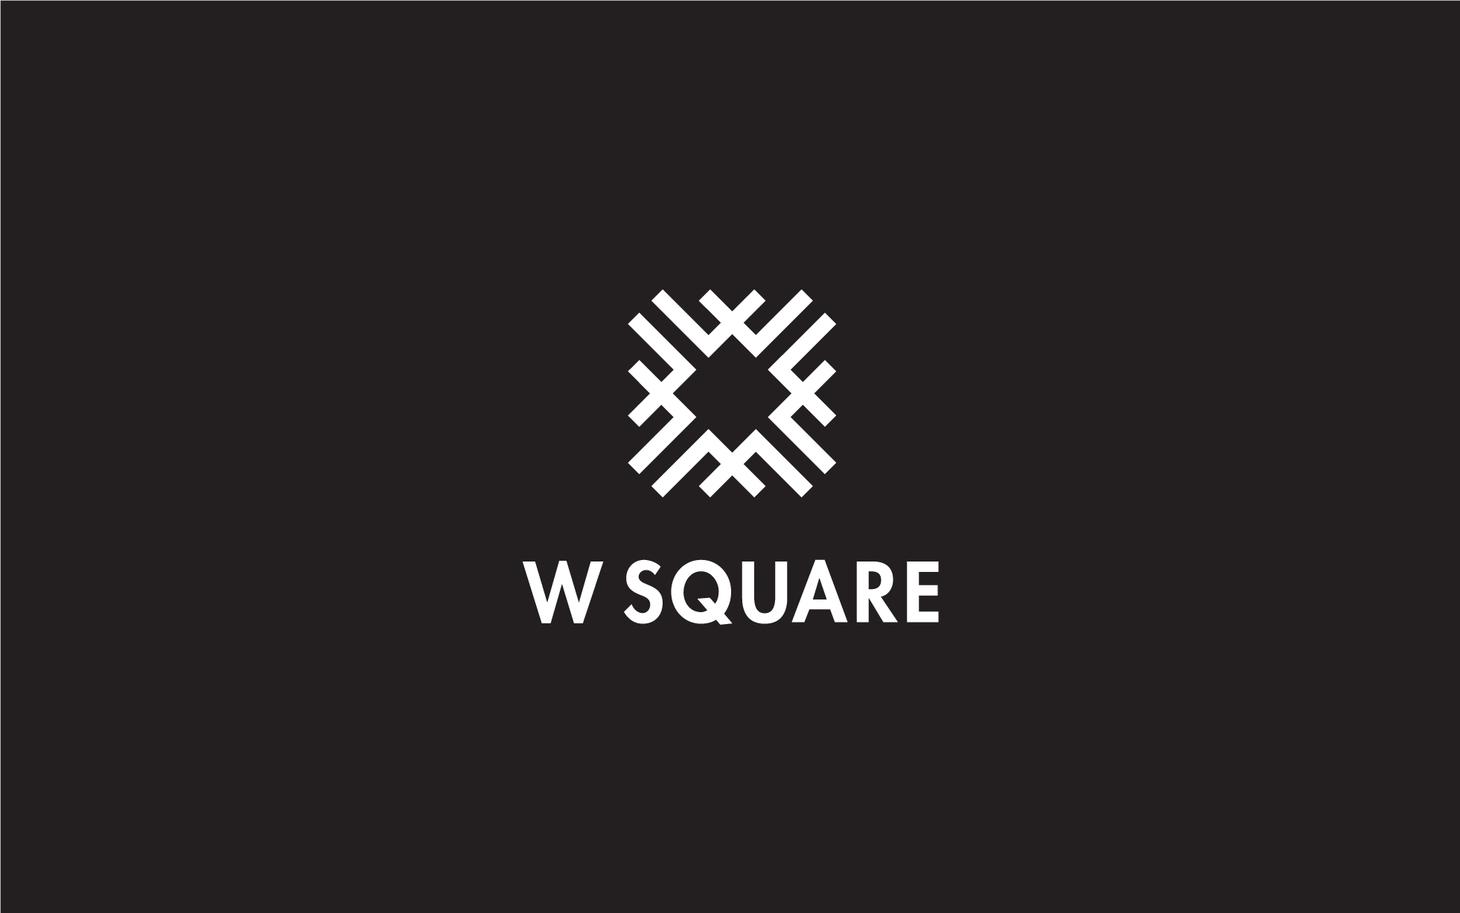 W Square 广场导视设计©Cizoo